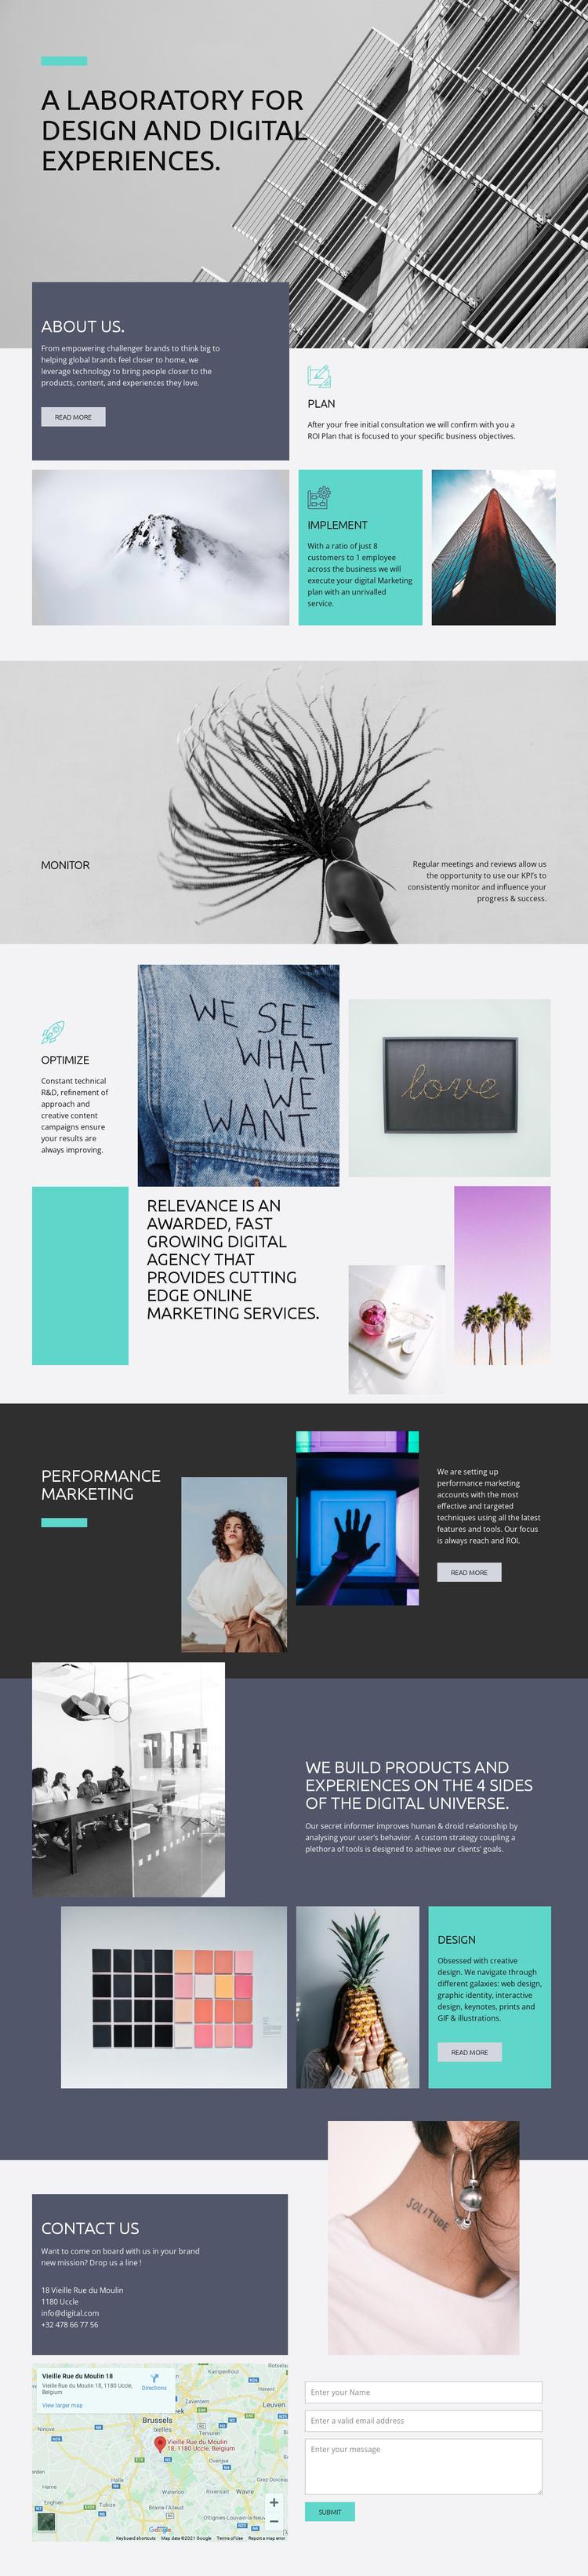 Creative lab for digital art Joomla Template